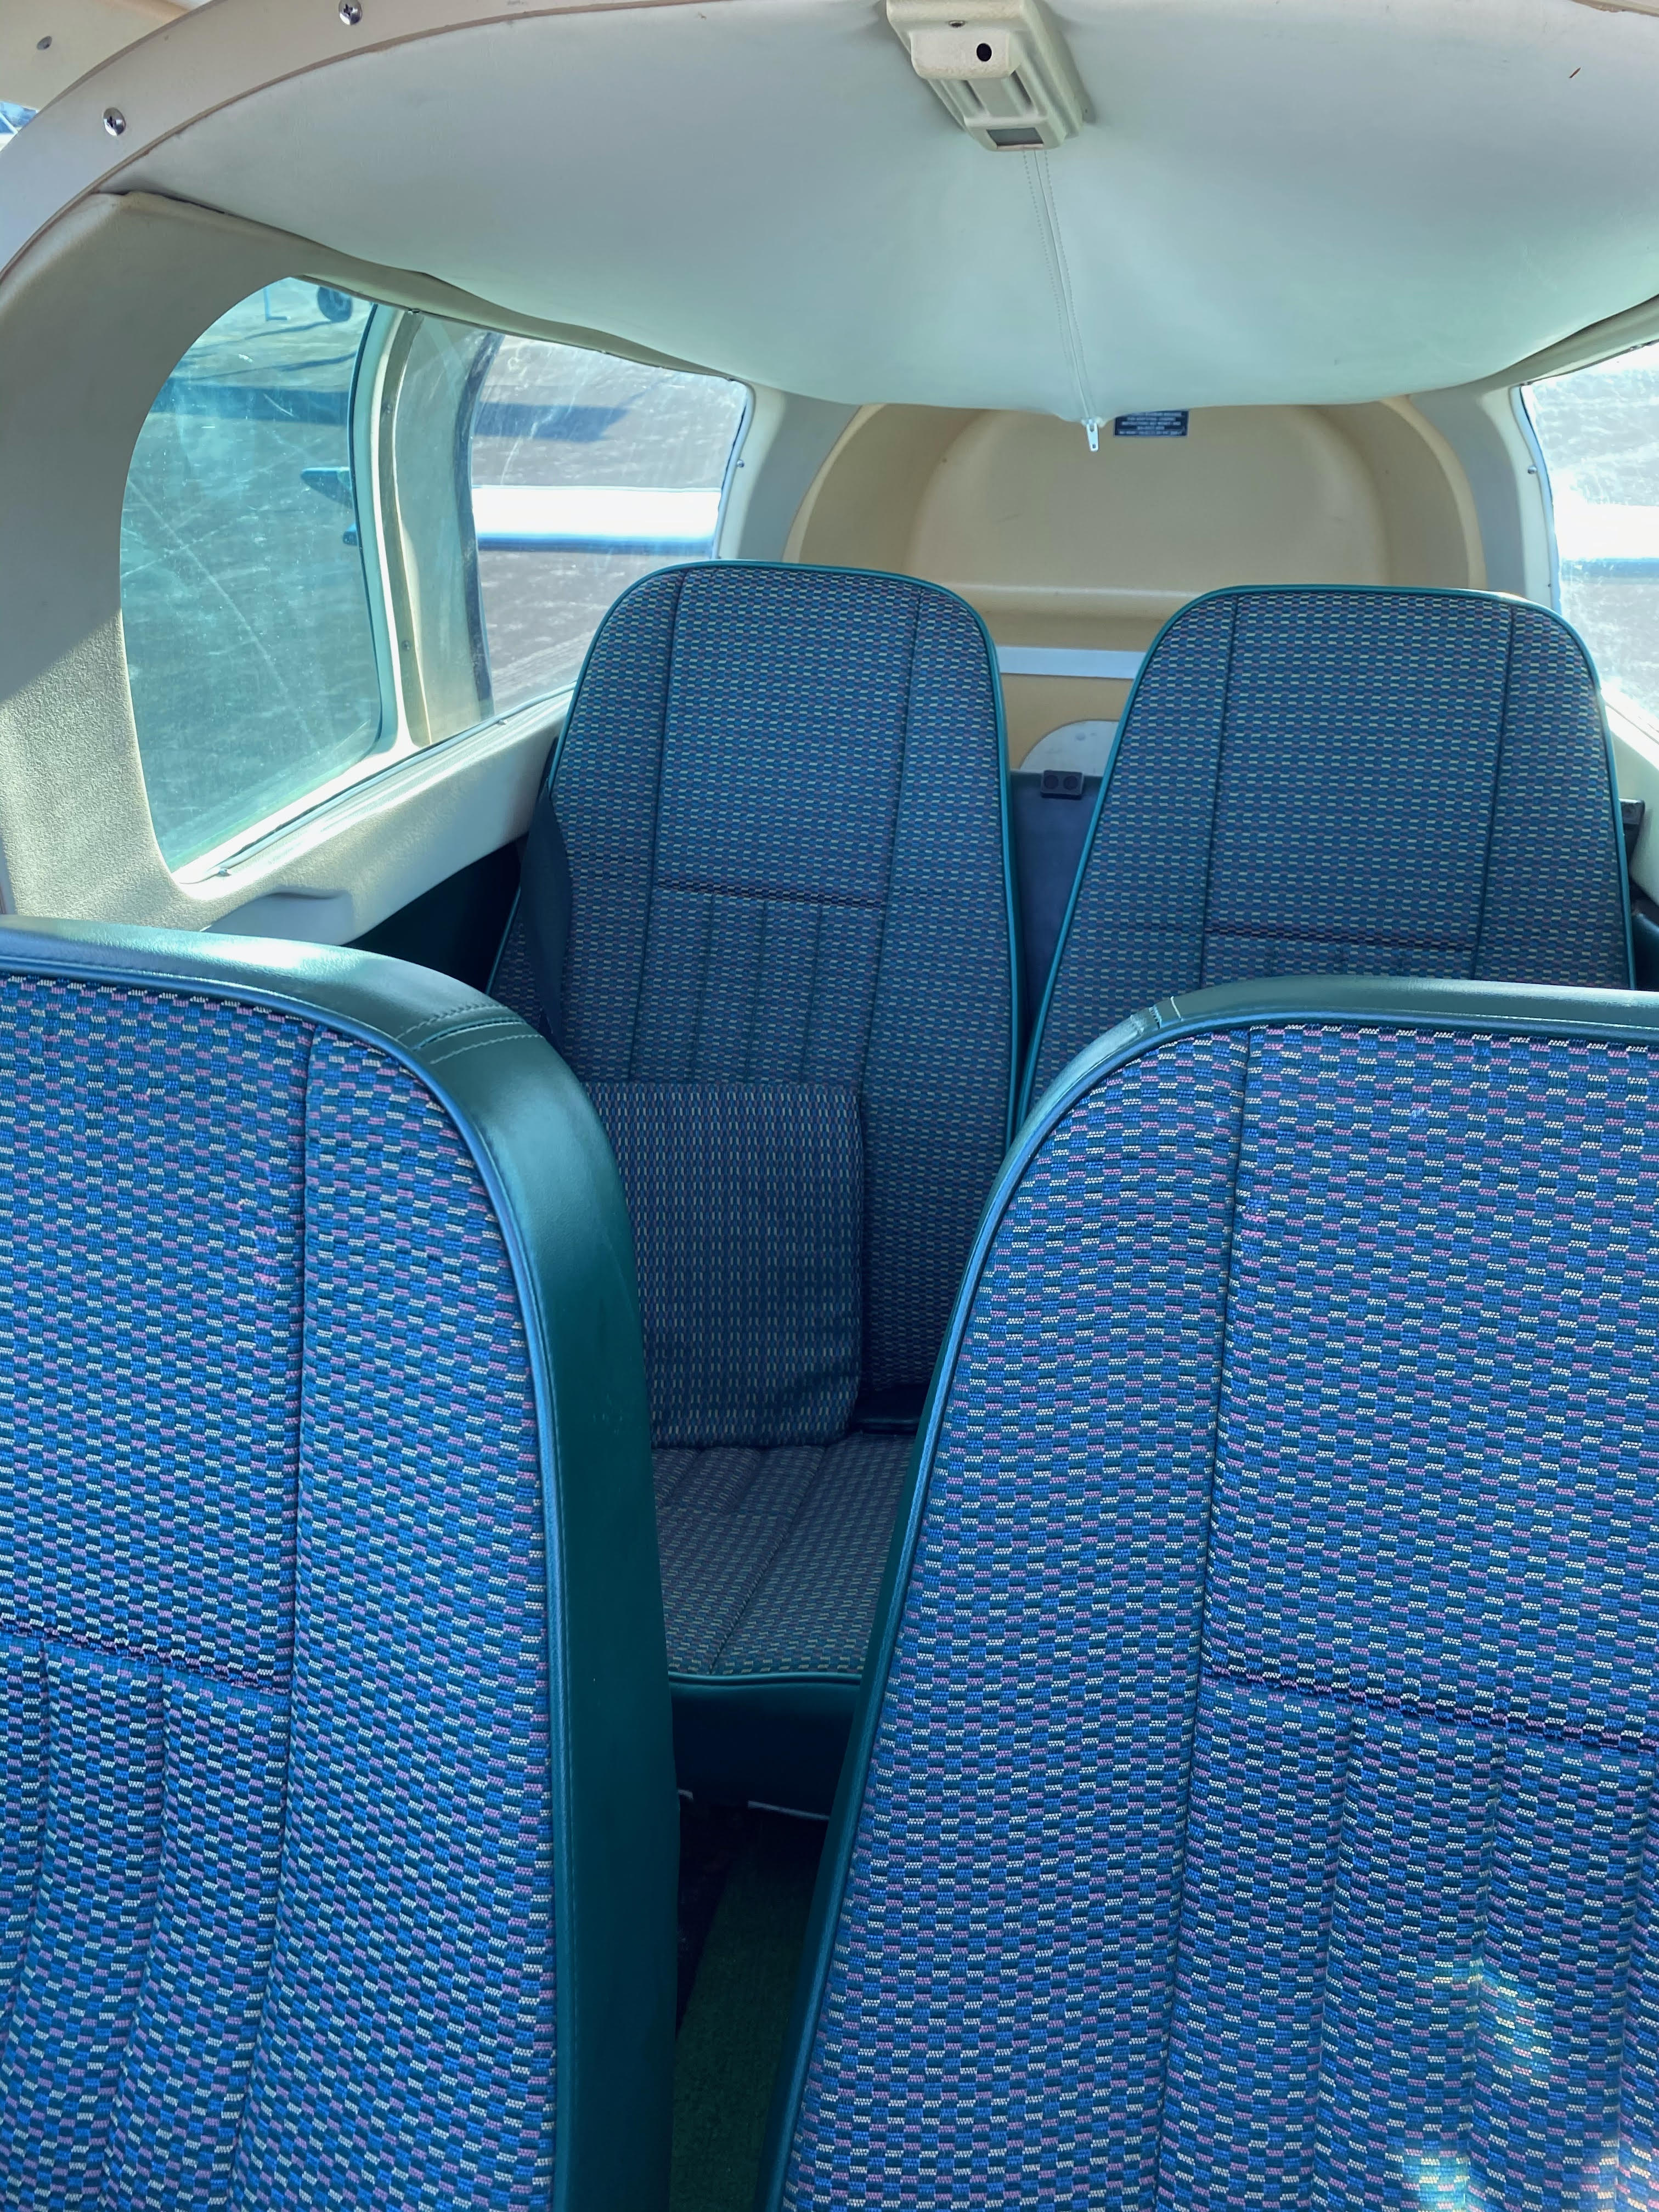 N33JX Seats